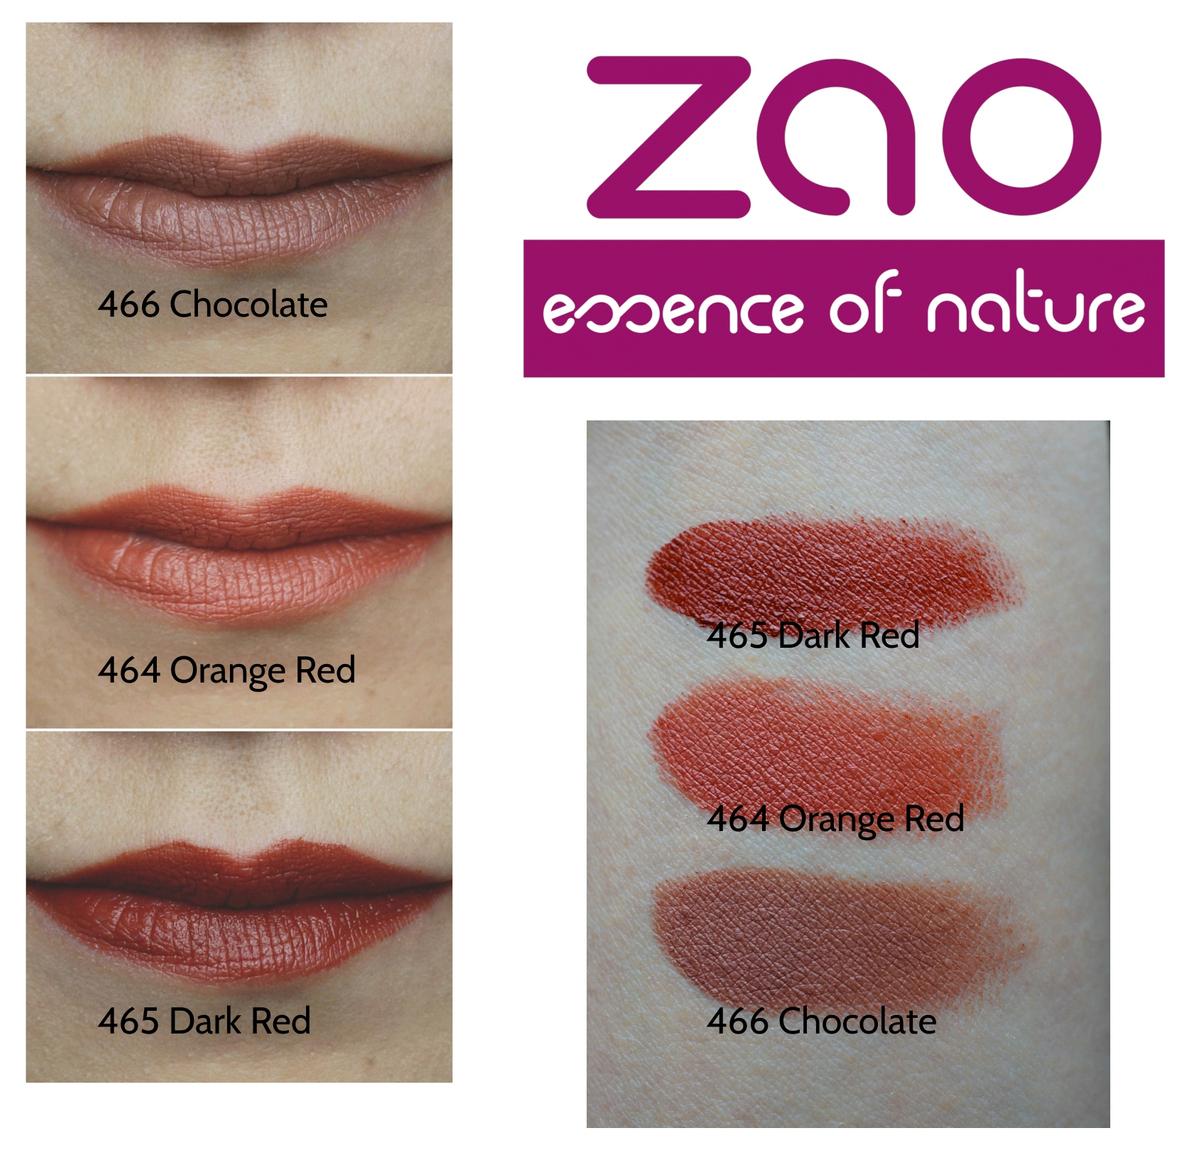 Zao Lipstick Chocolate, Dark Red, Orange Red Swatches